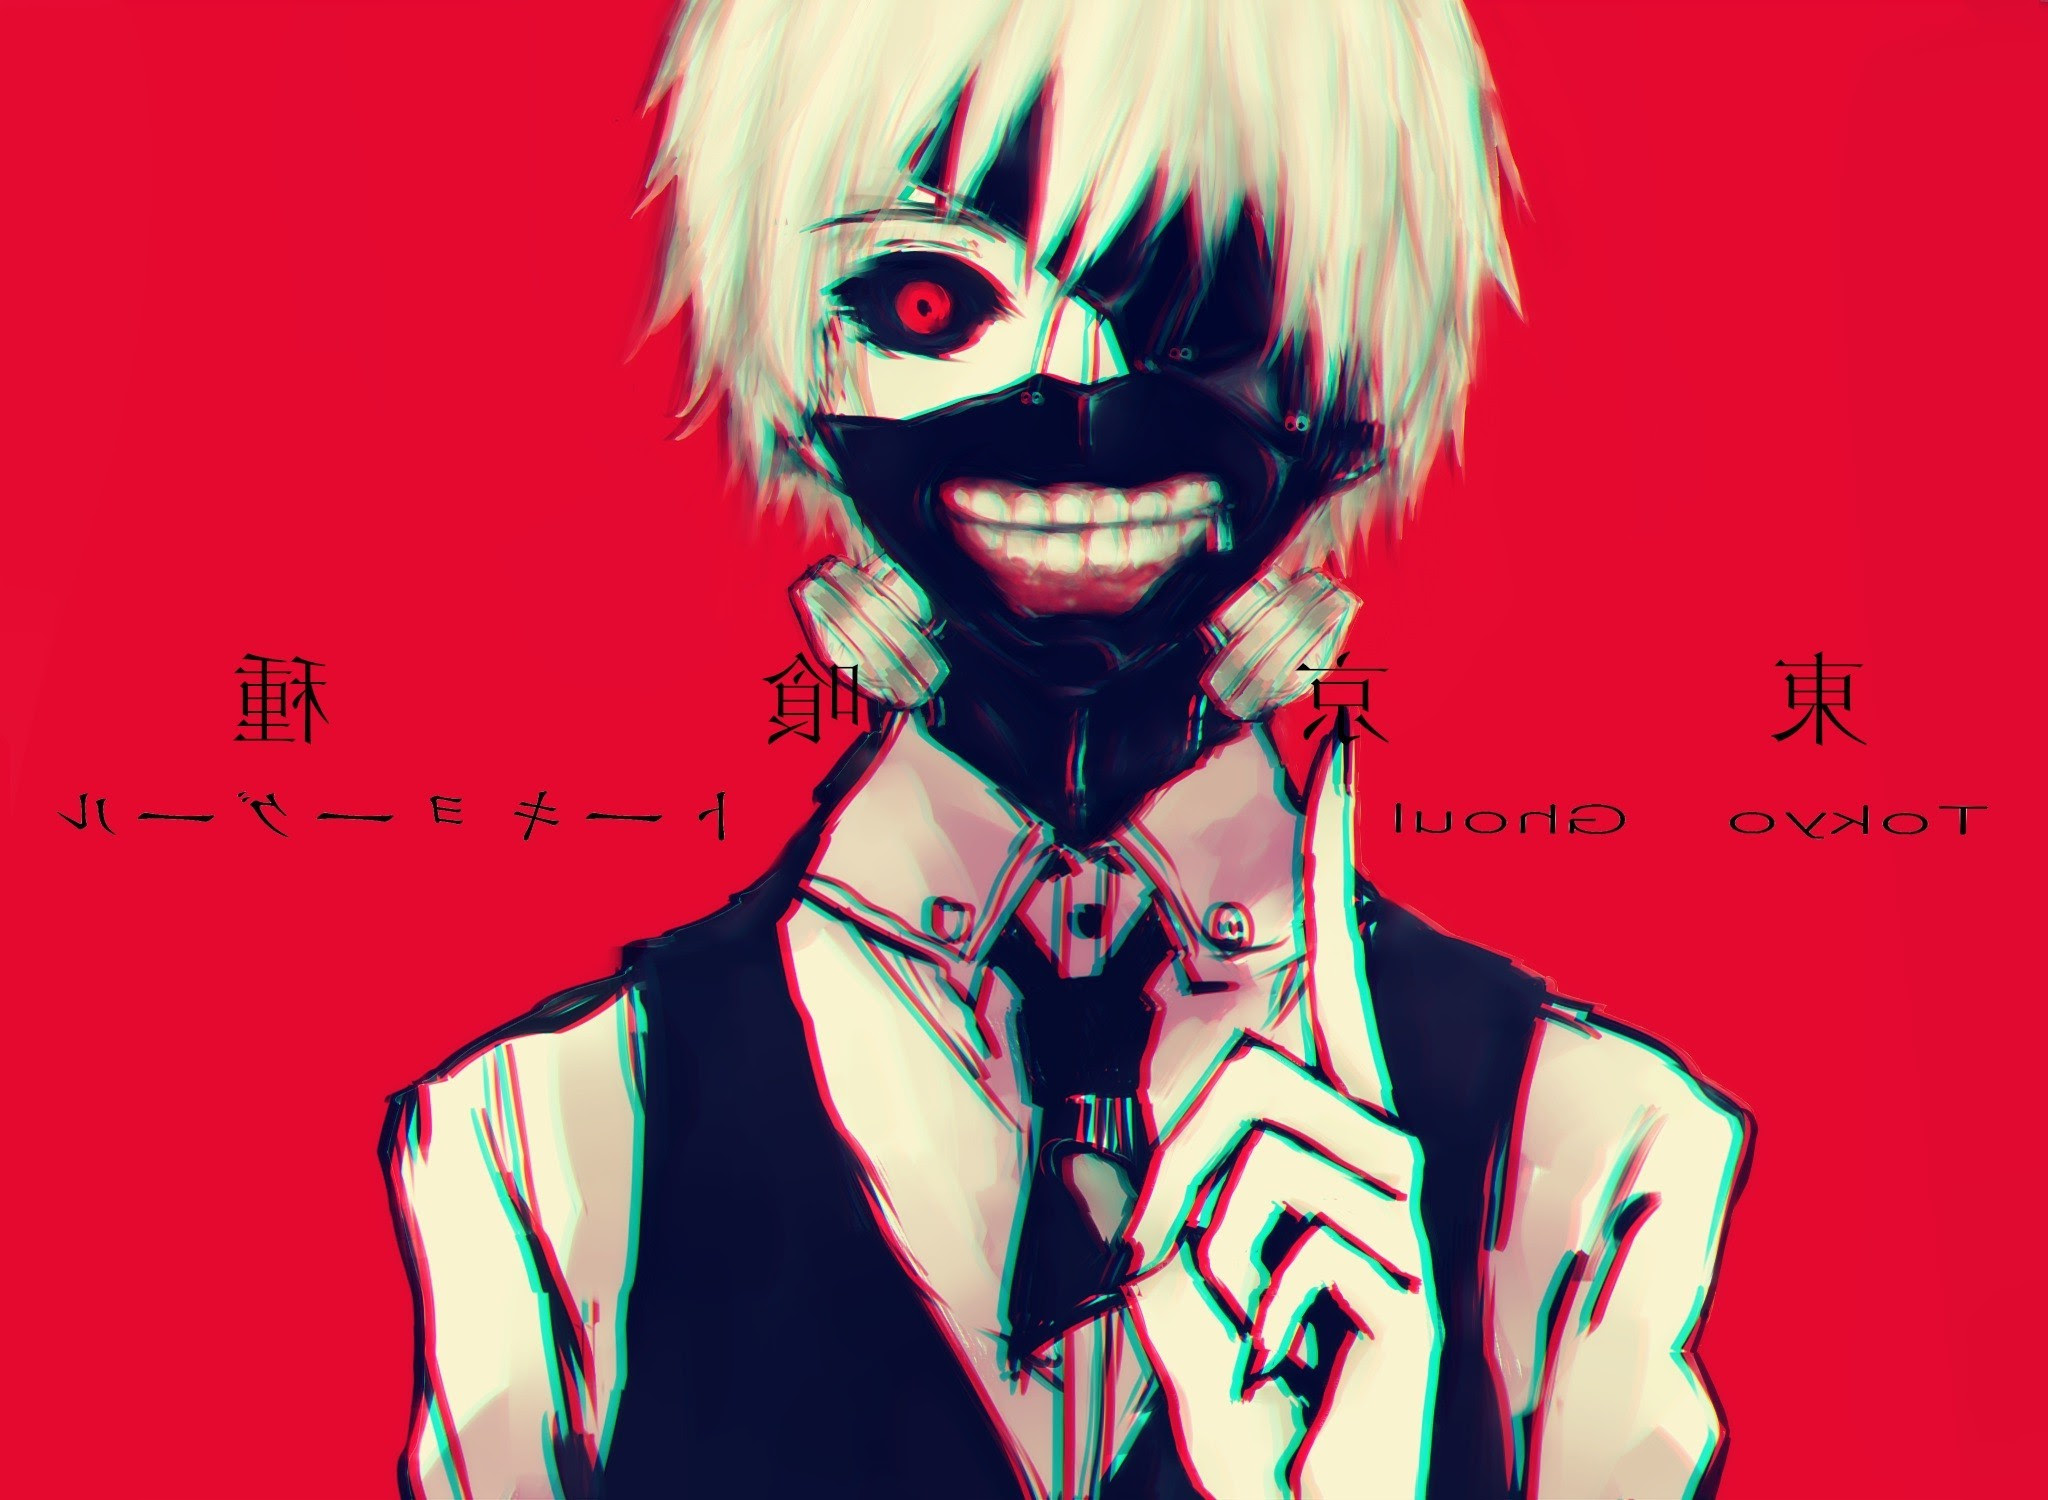 Tokyo Ghoul Re Wallpaper (83+ images)